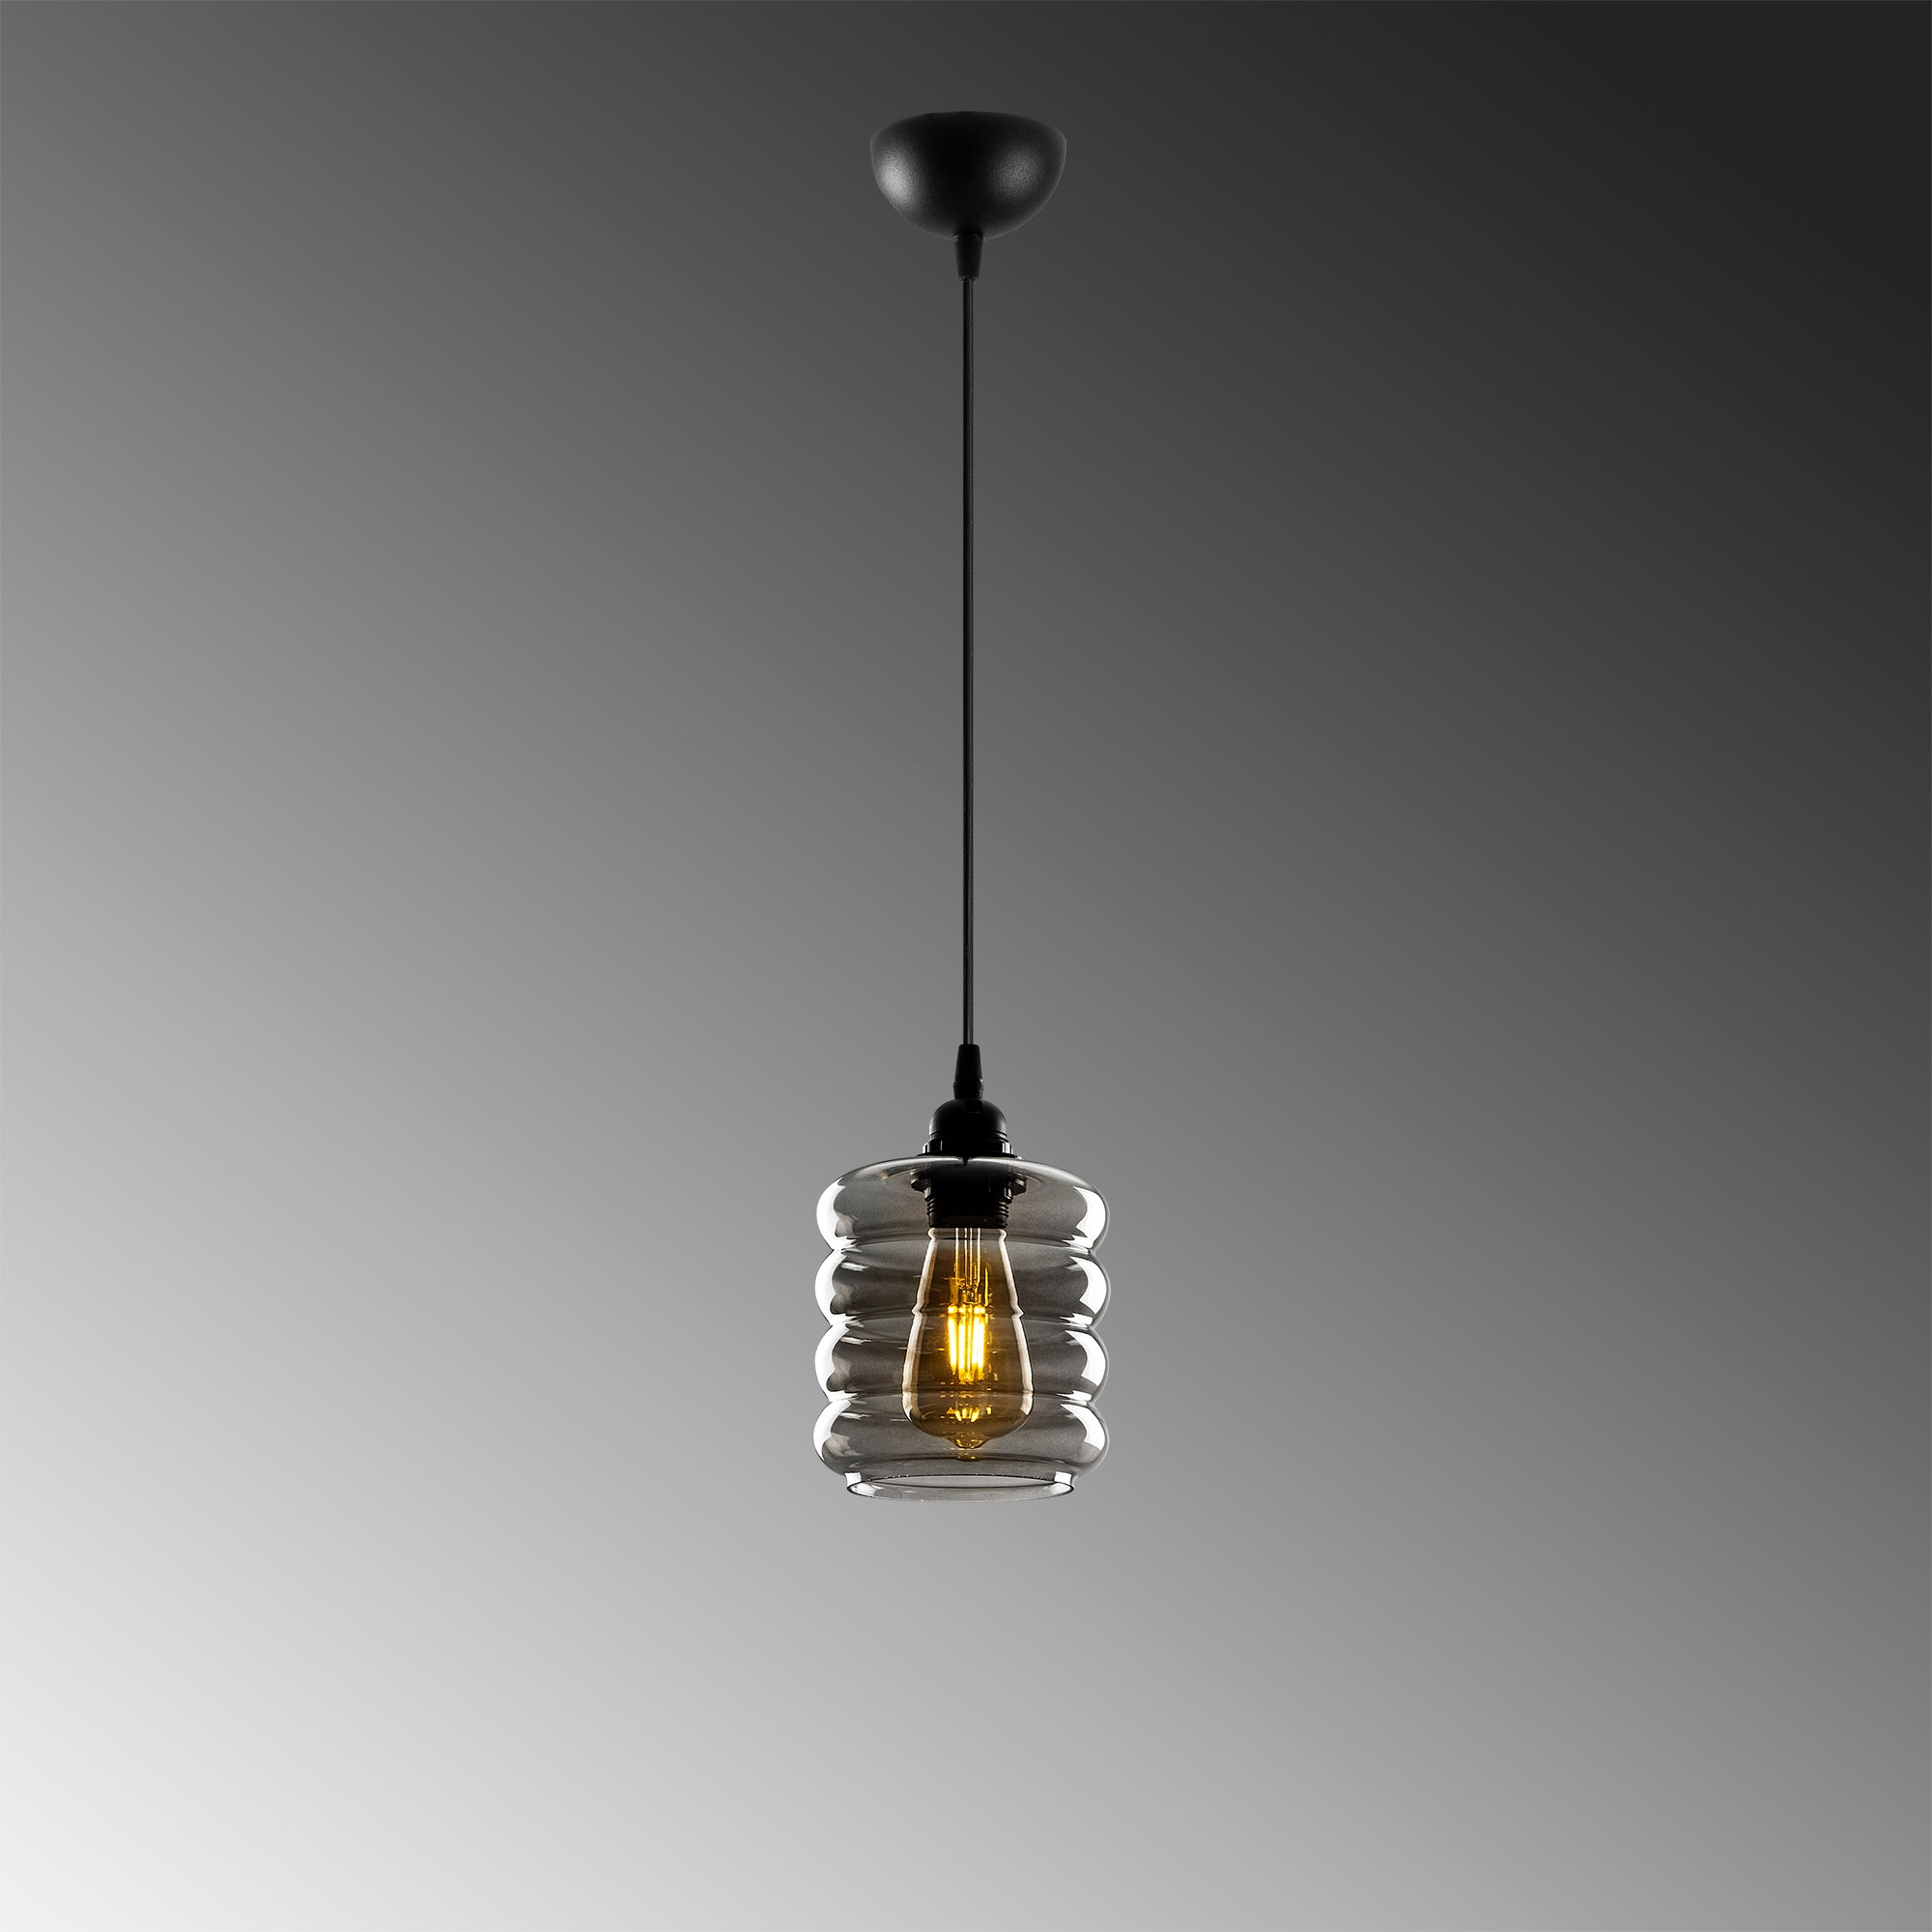 Led hanglamp met golven 1 x E27 fitting - grijze achtergrond